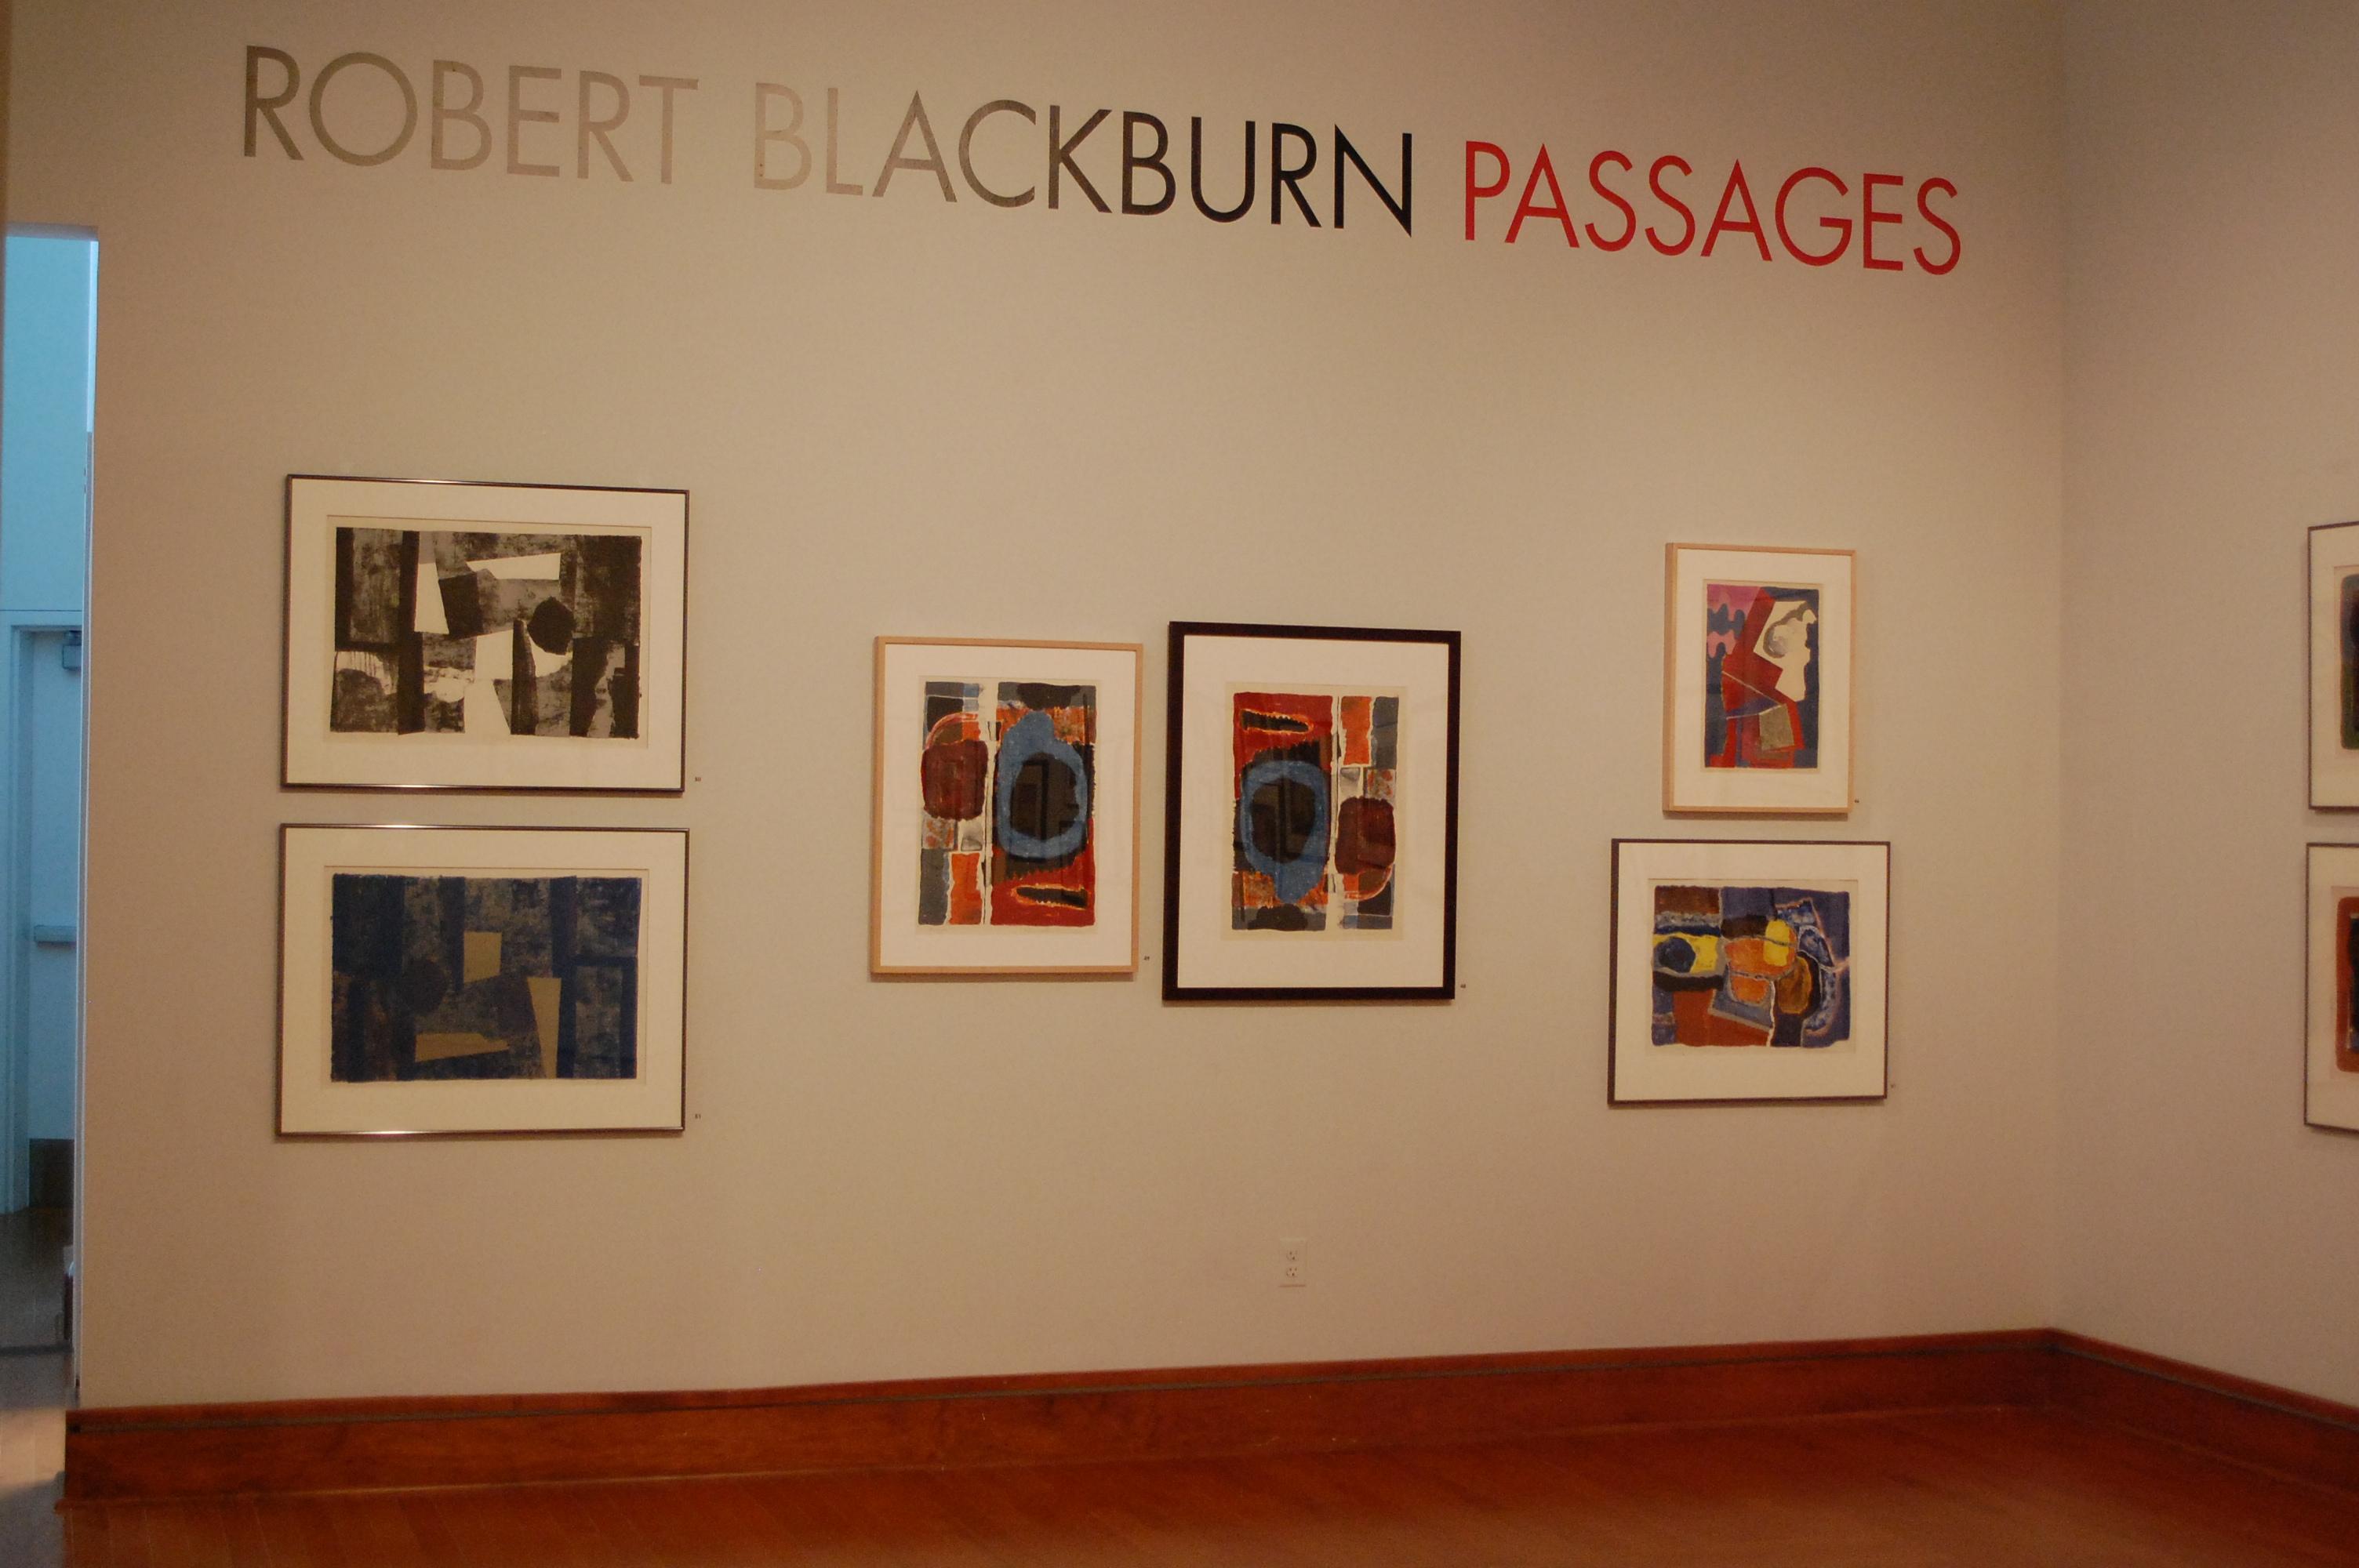 Robert Blackburn Passages